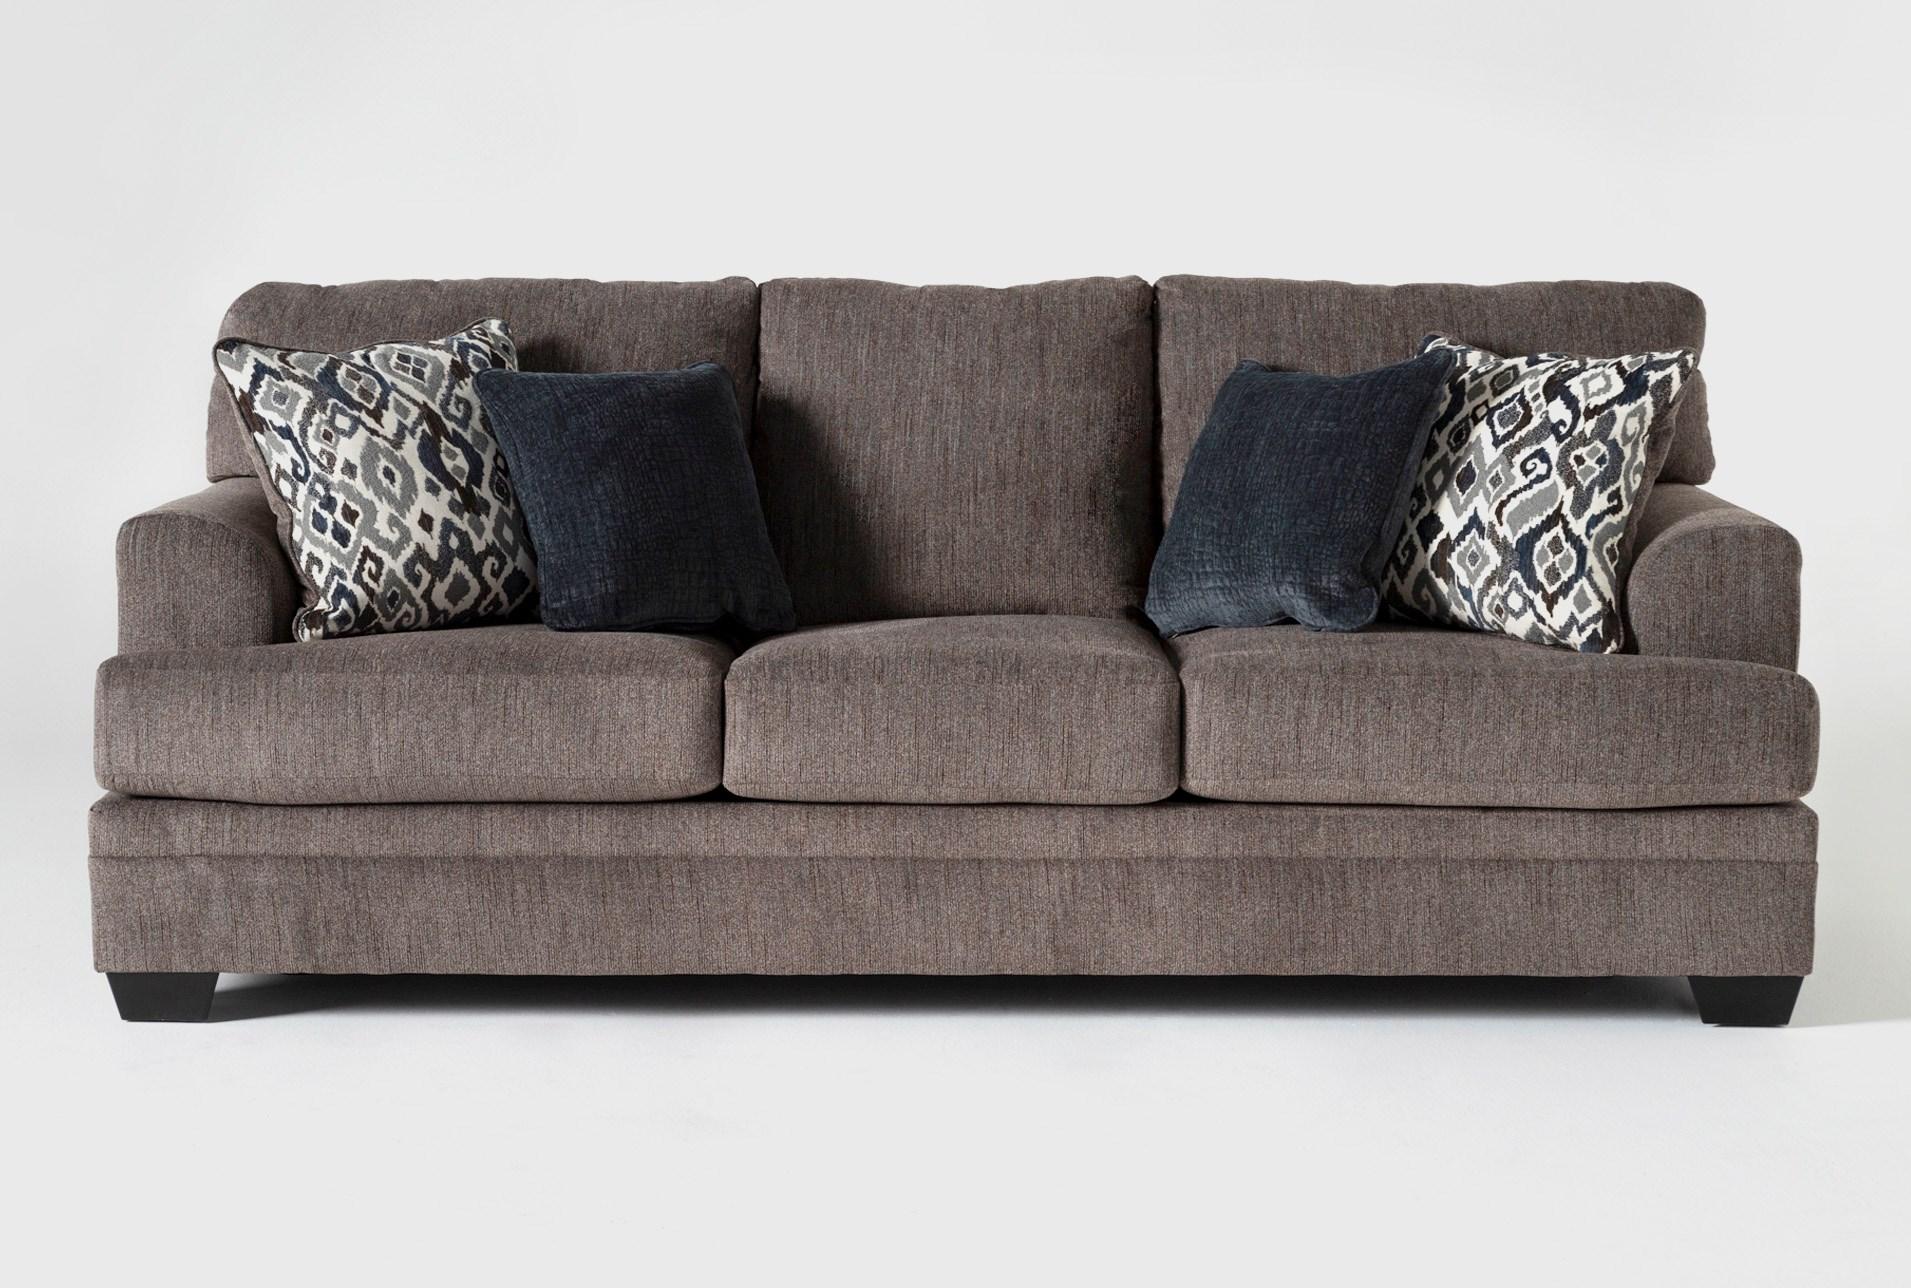 Harland 92 Sofa Living Spaces, Comfort Living Furniture San Leandro